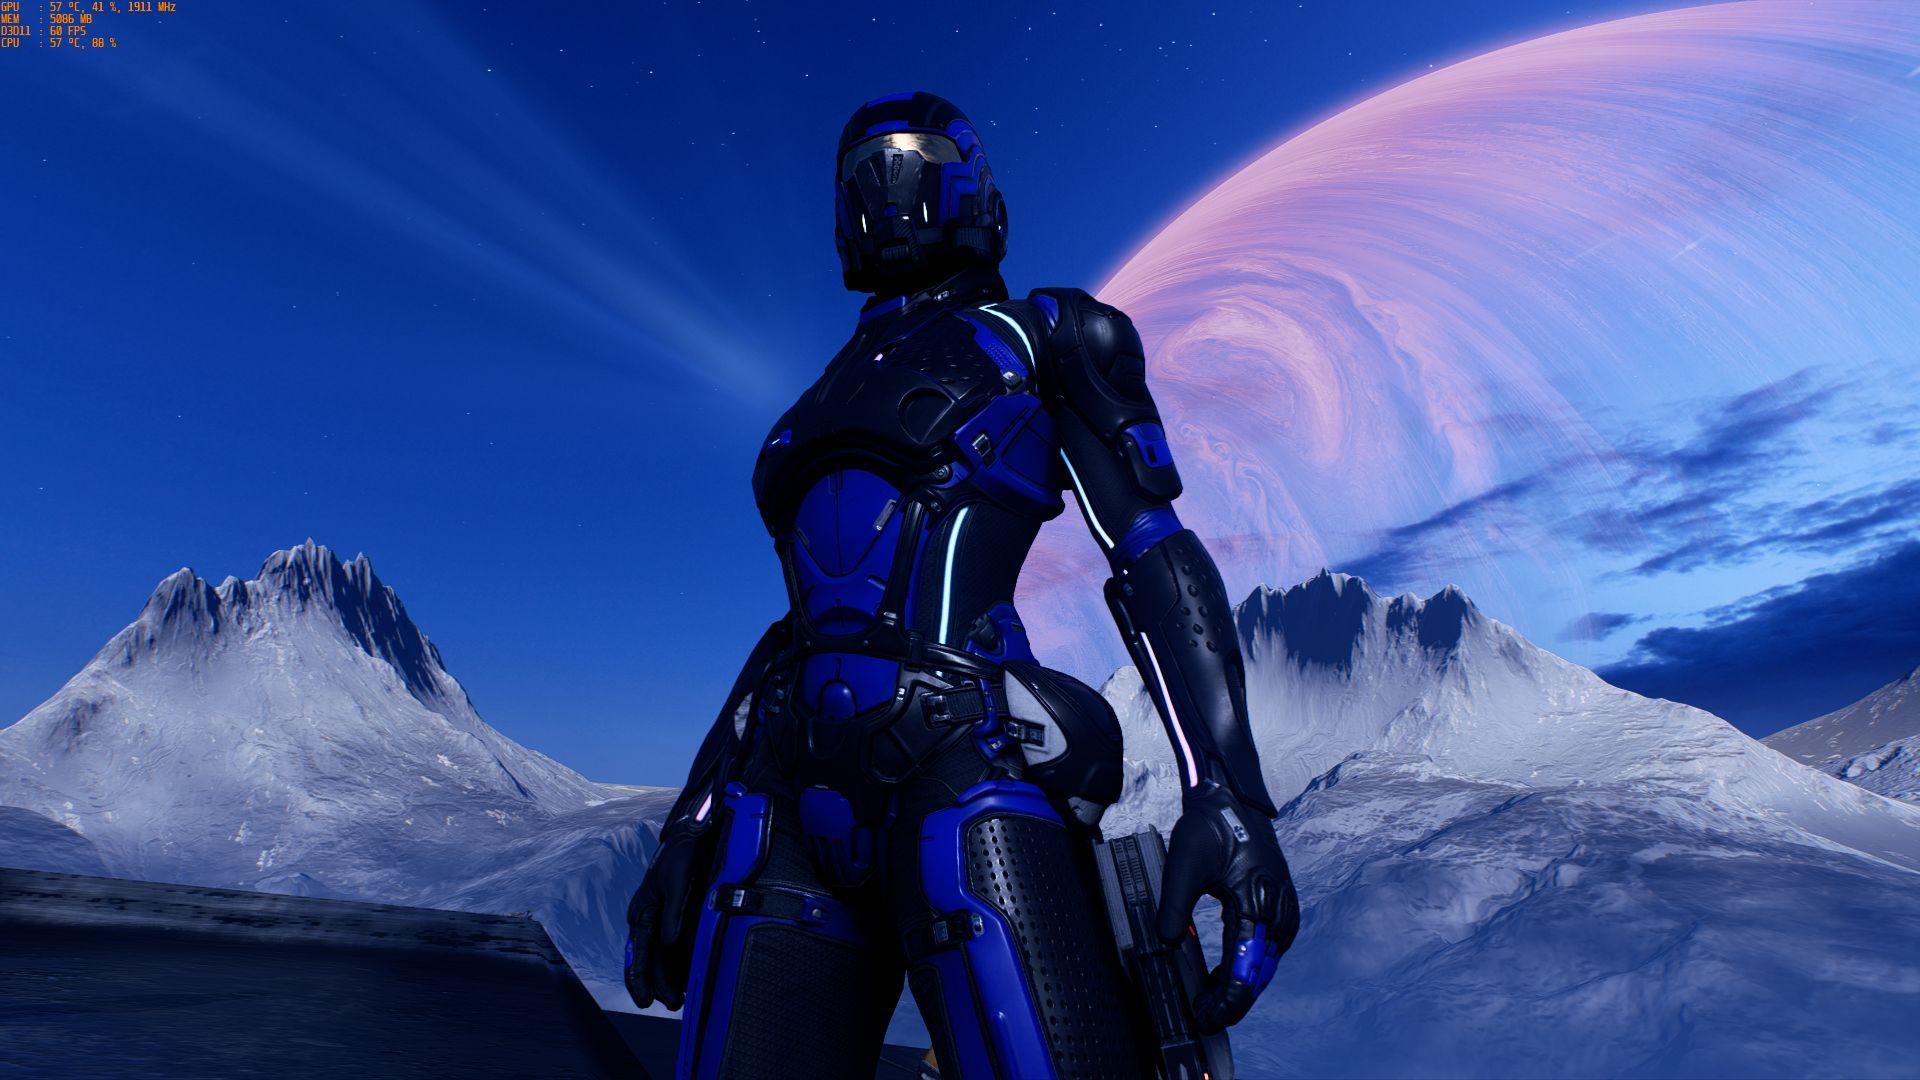 Mass Effect Andromeda Screenshot 2017.07.30 - 18.04.37.46.jpg - Mass Effect: Andromeda